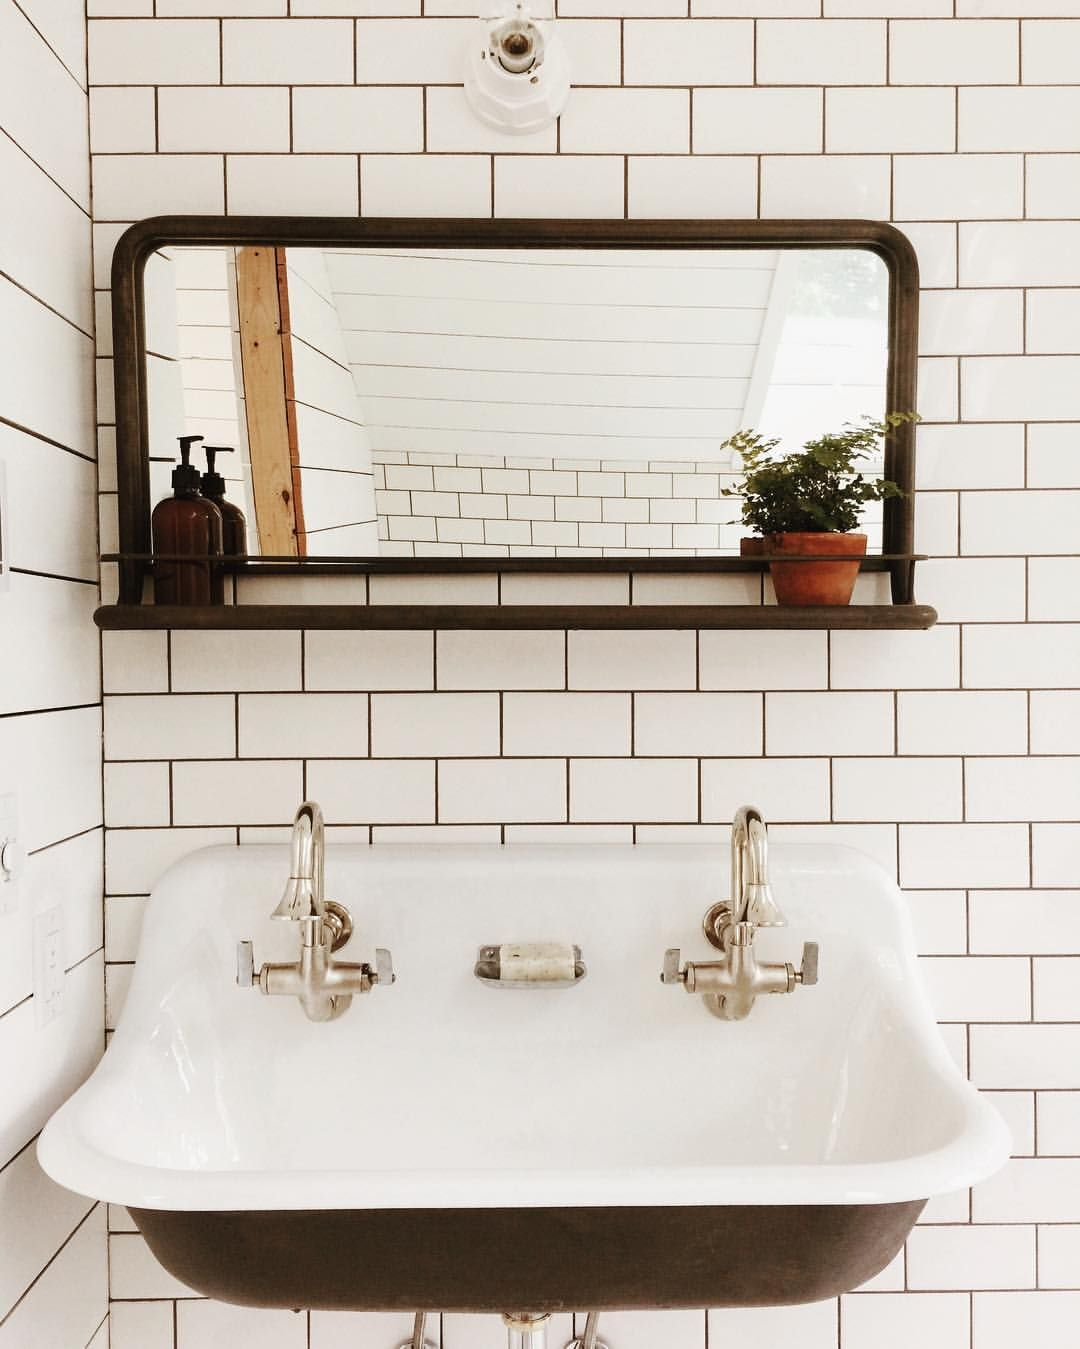 Amazon Pharmacy Mirror Subway Tile Kohler Brockway Trough Sink Stylish Bathroom Bathrooms Remodel Vintage Bathroom